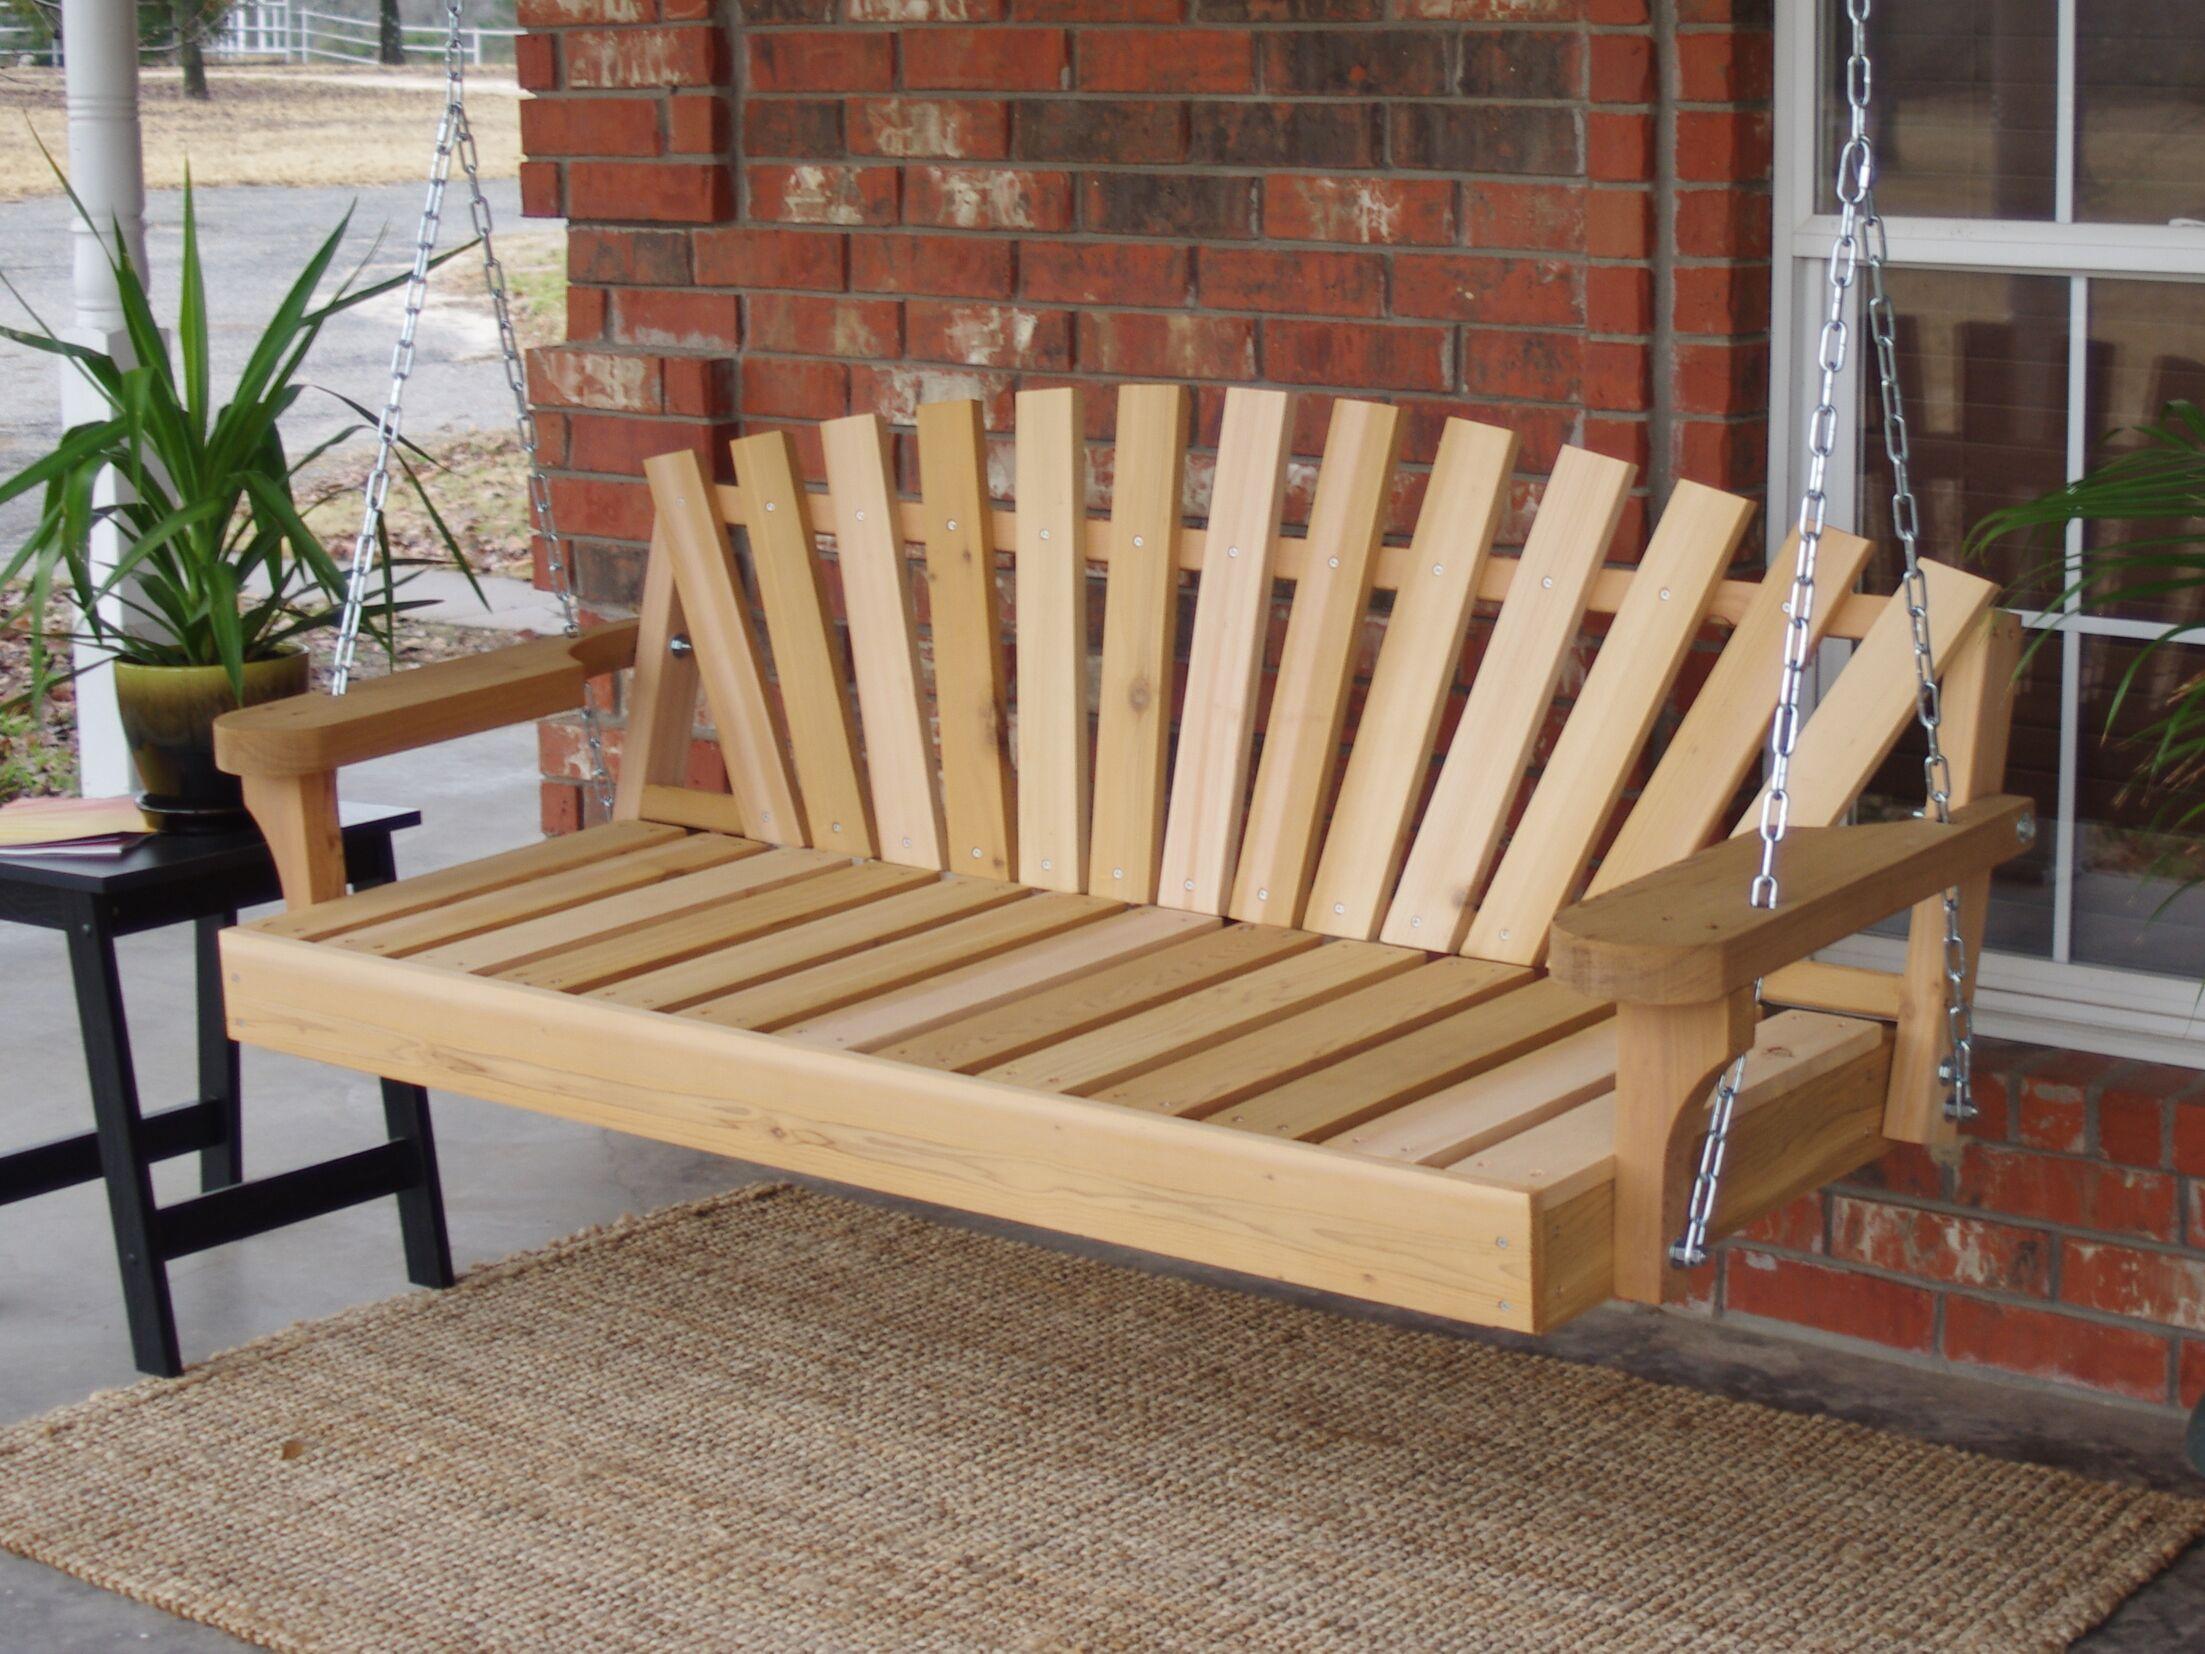 Hindman Sunrise Cedar Porch Swing Finish: Natural/Stainless Steel, Size: 24